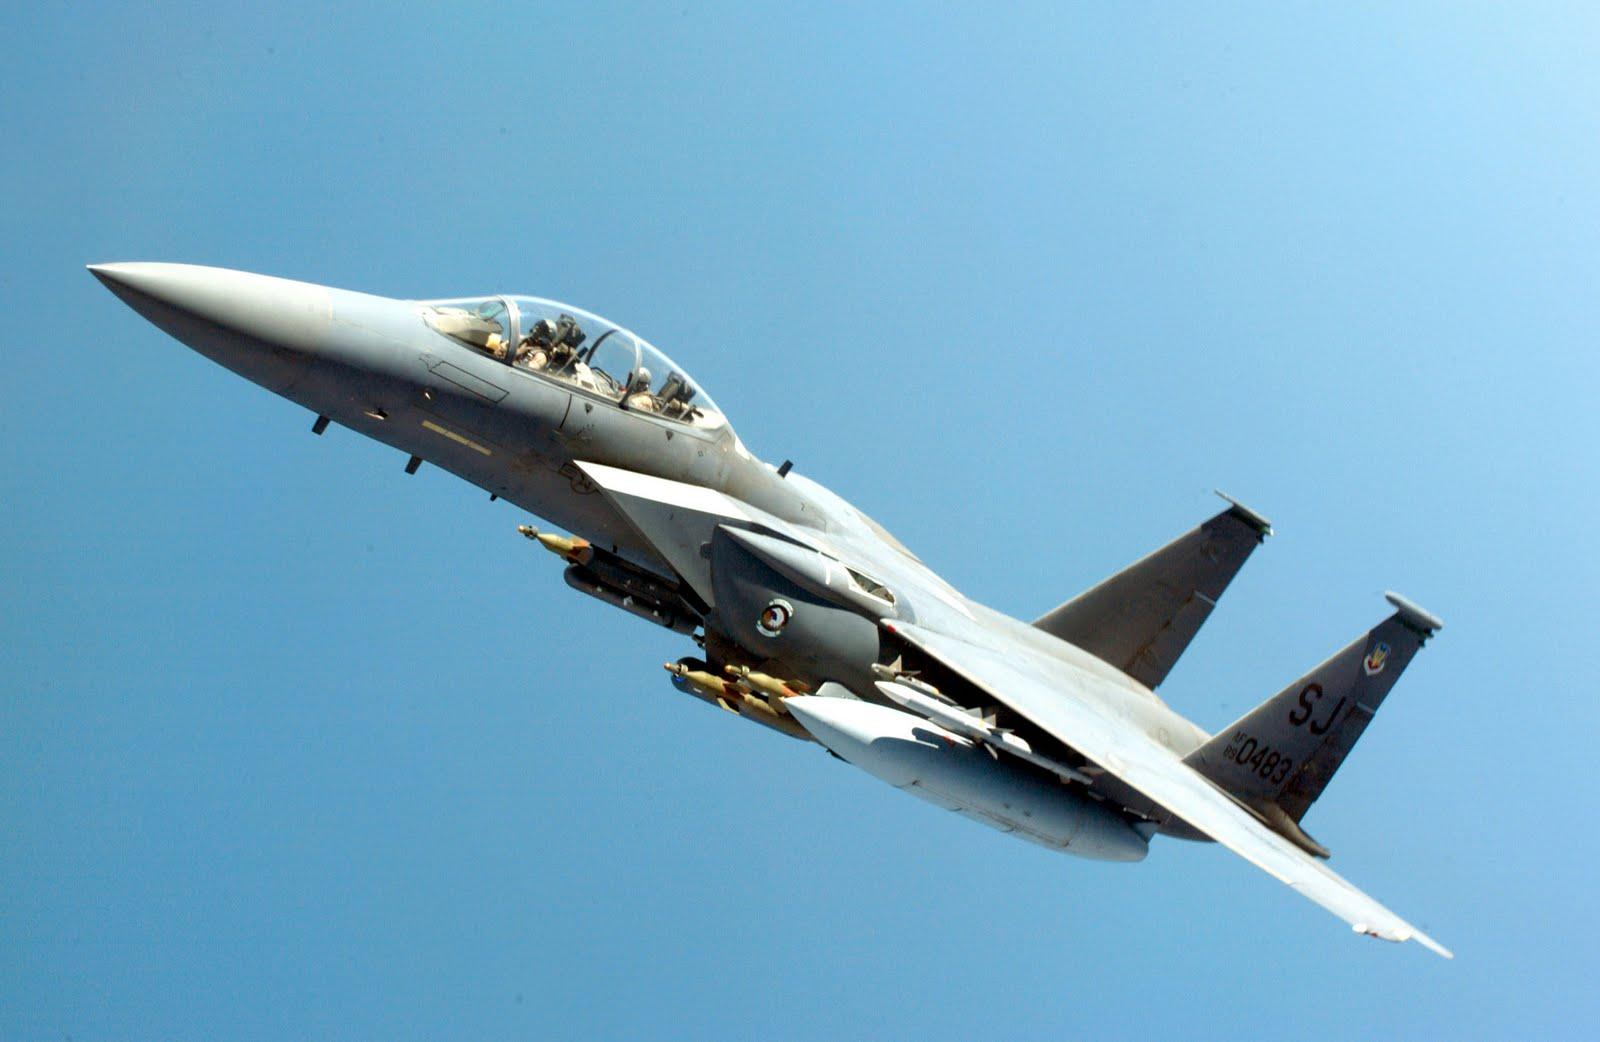 F 15 Strike Eagle Plane: F-15E Strike Ea...